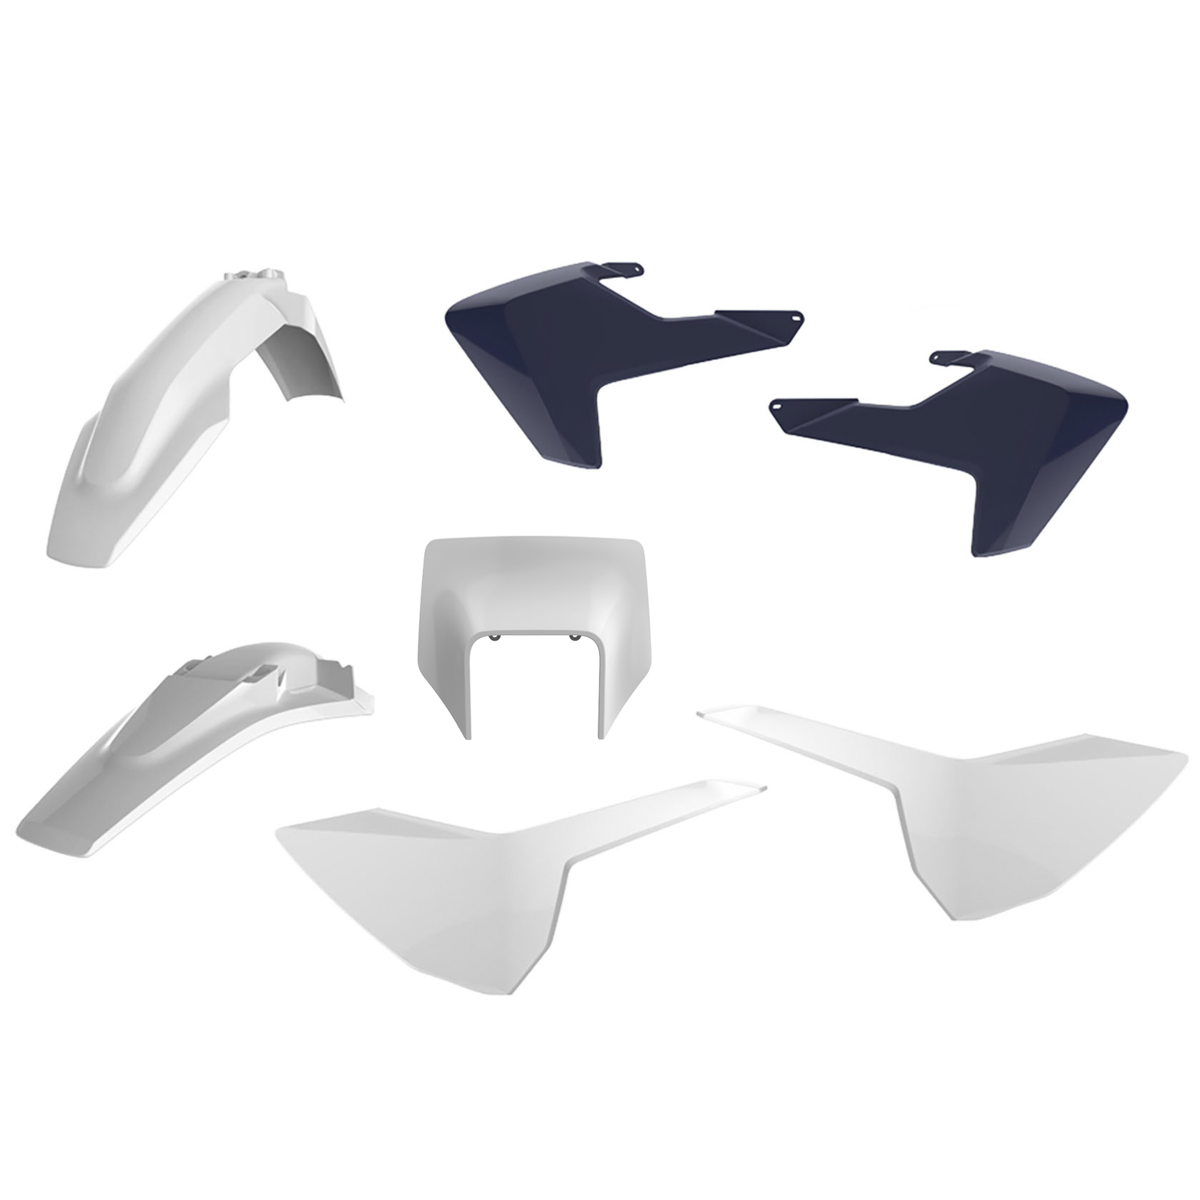 Kit Plástico Polisport Husqvarna Fe 250/350/450 Te 250/300 17/19